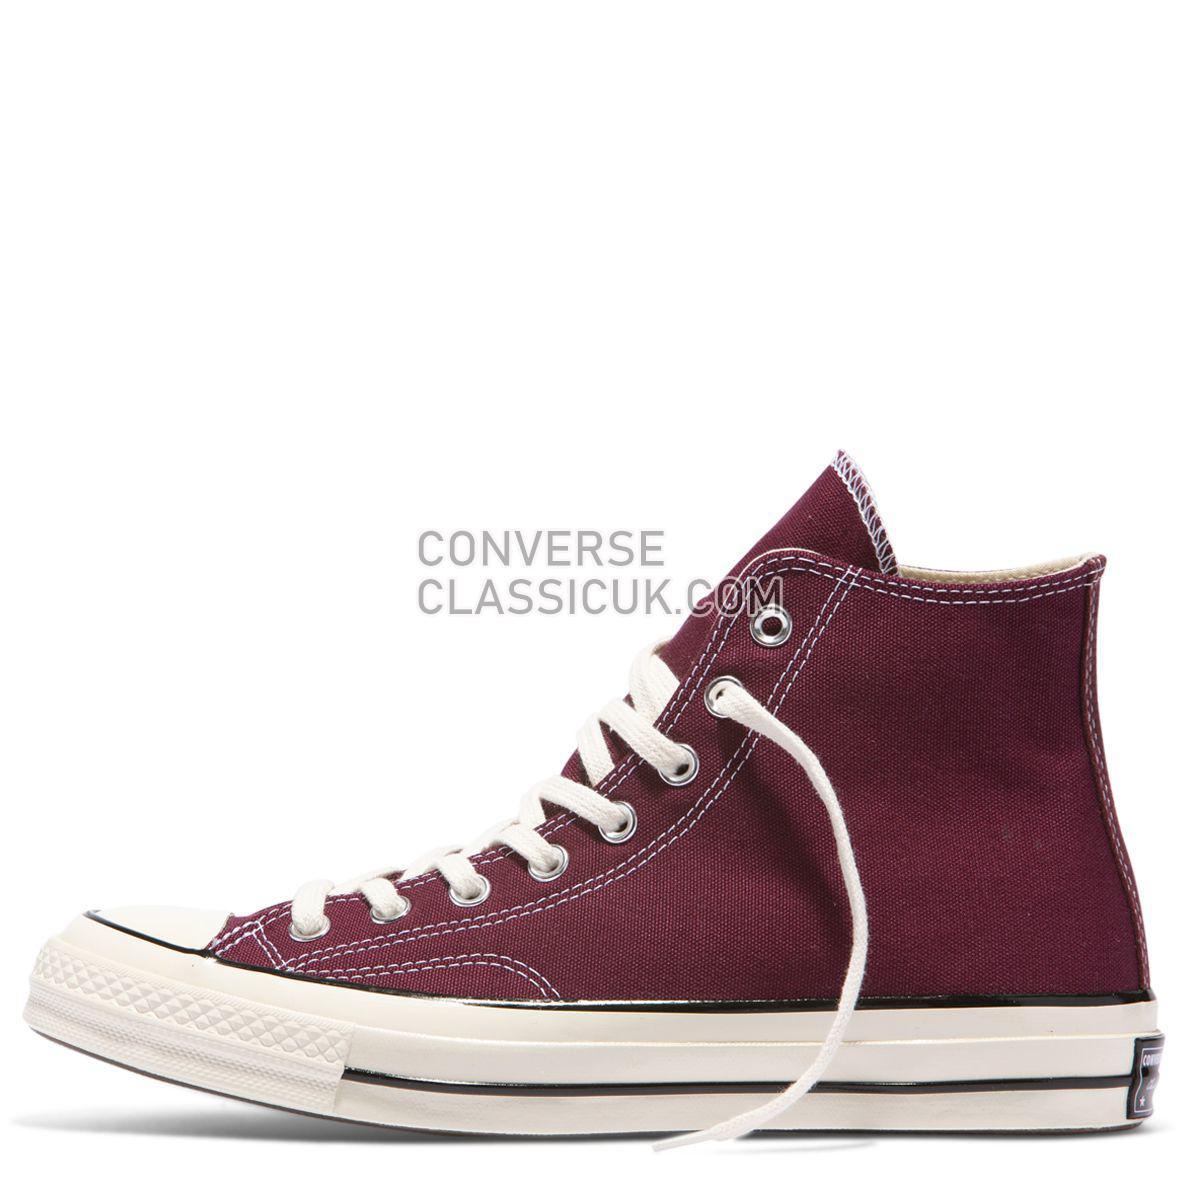 Converse Chuck Taylor All Star 70 Vintage Canvas High Top Dark Burgundy Mens Womens Unisex 162051 Dark Burgundy/Black/Egret Shoes